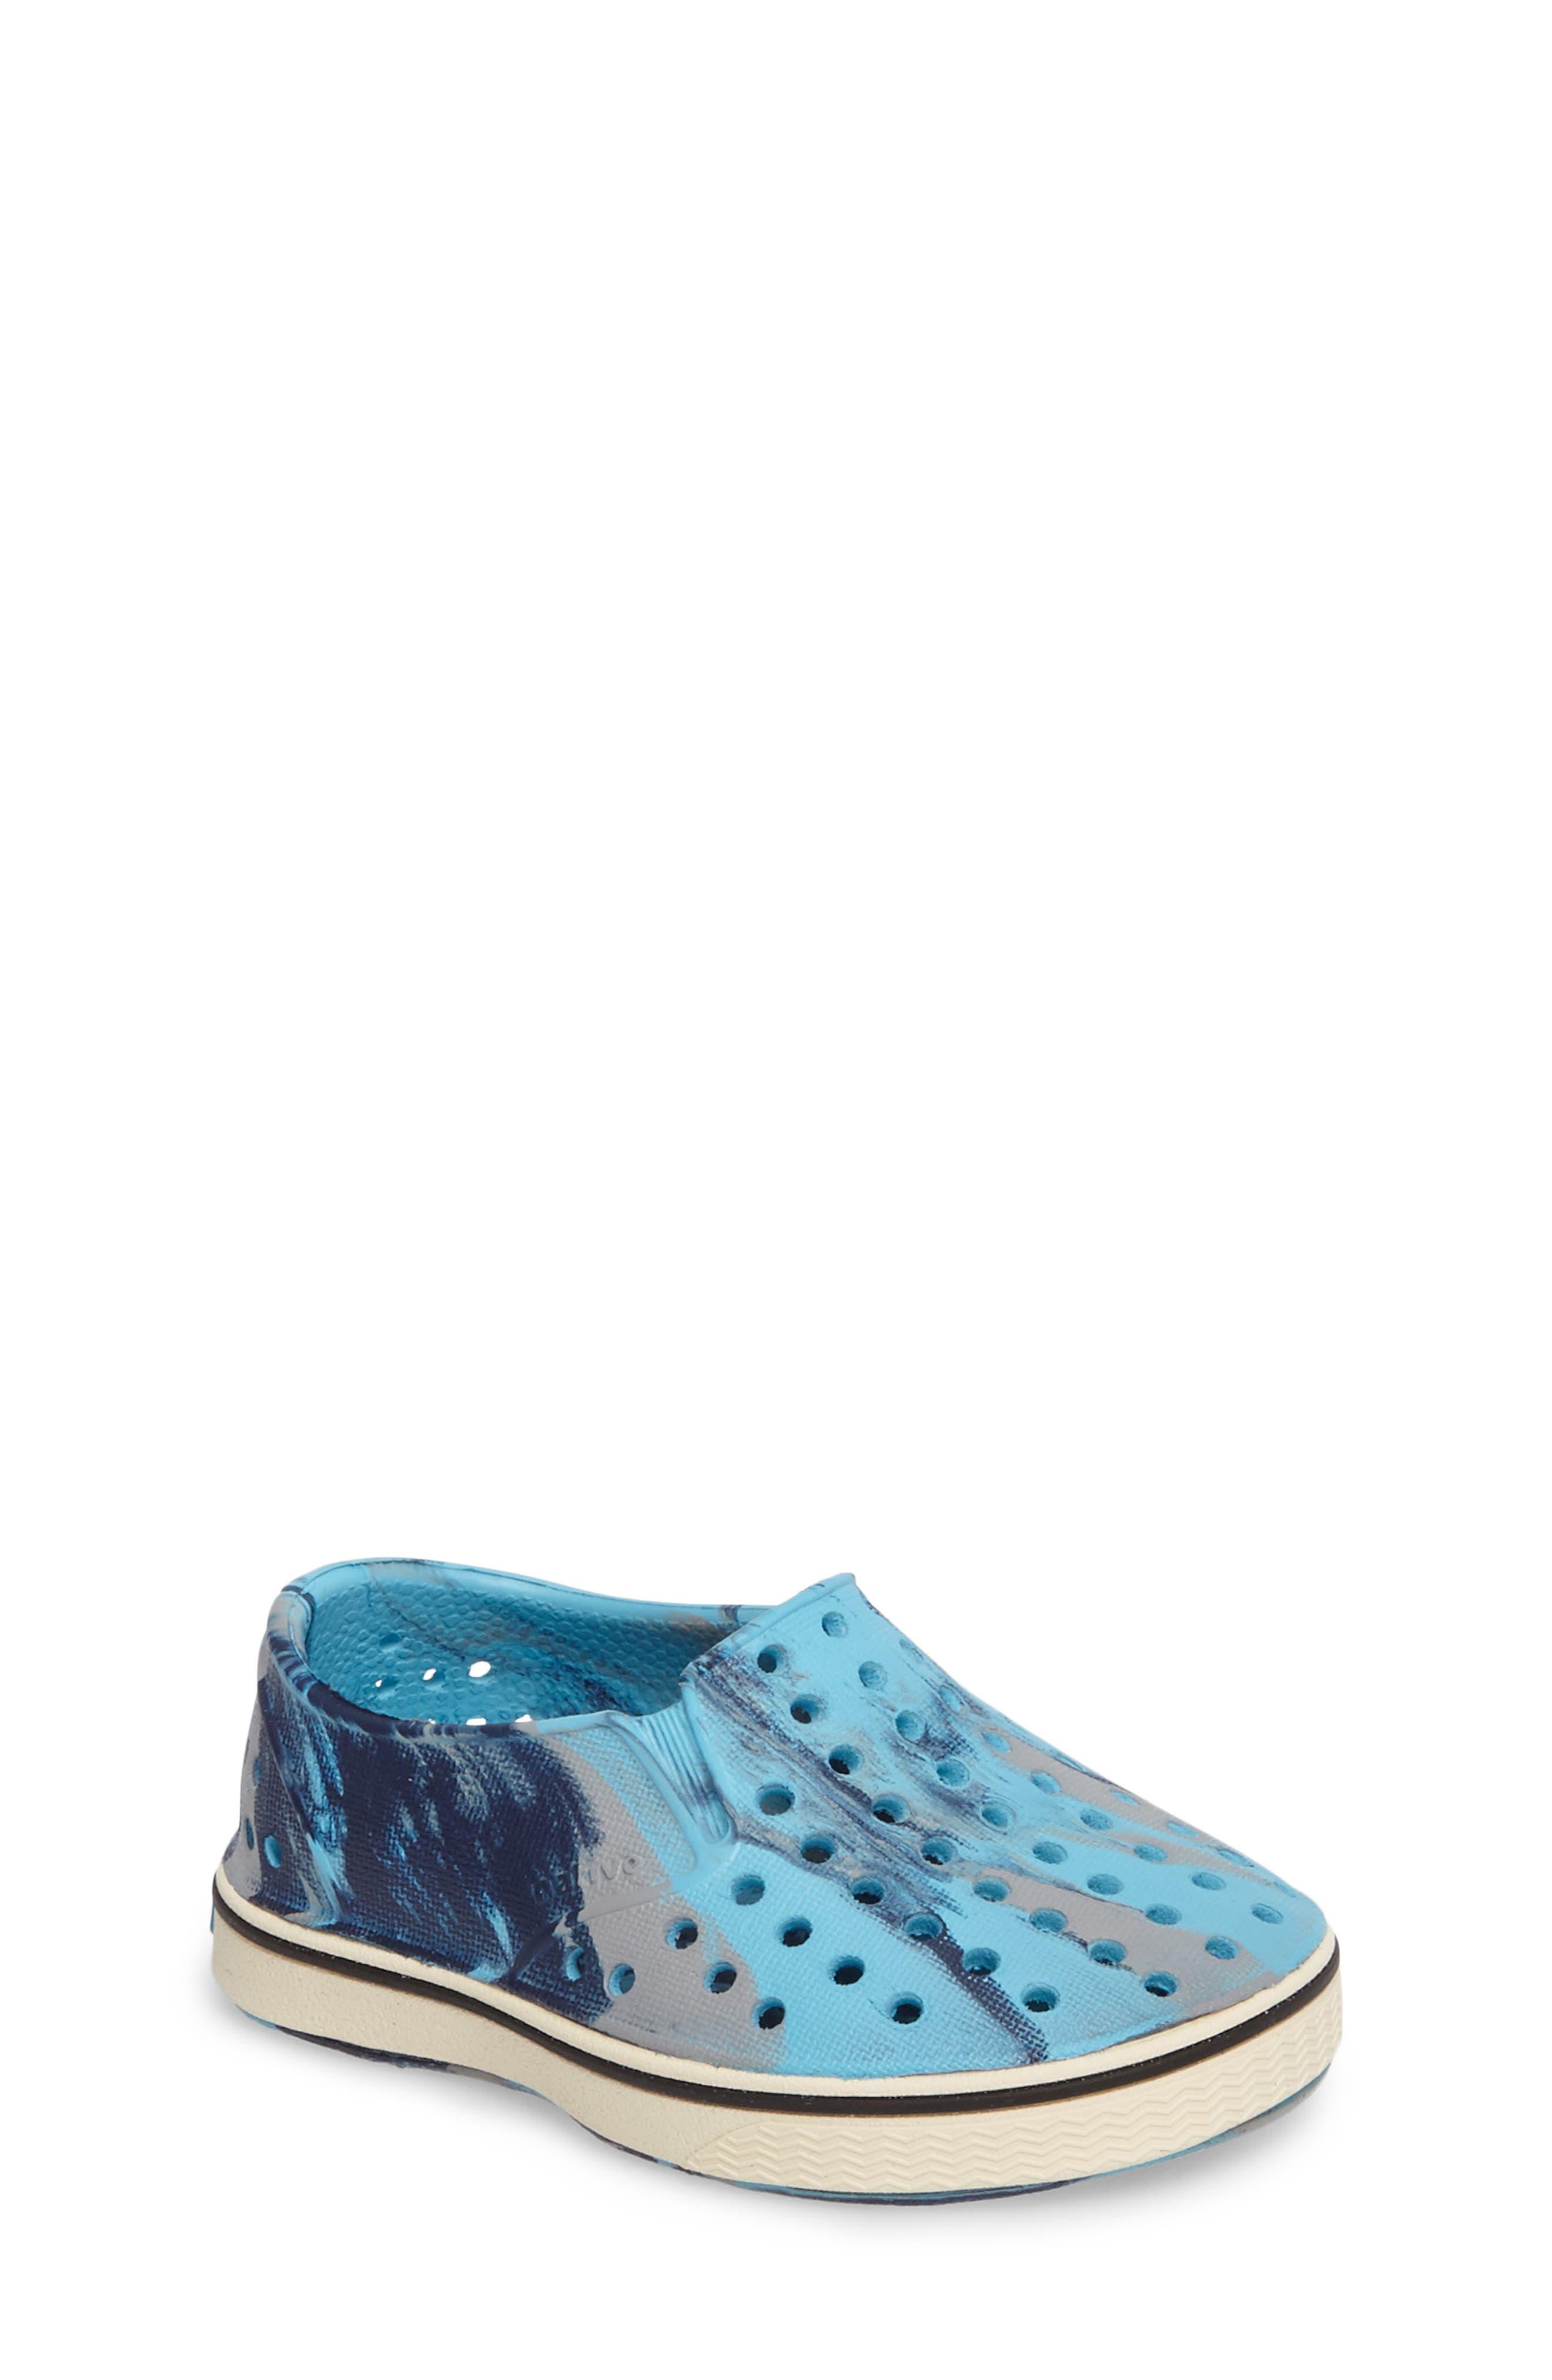 Alternate Image 1 Selected - Native Shoes Miles Marbled Slip-On Sneaker (Baby, Walker, Toddler, Little Kid & Big Kid)